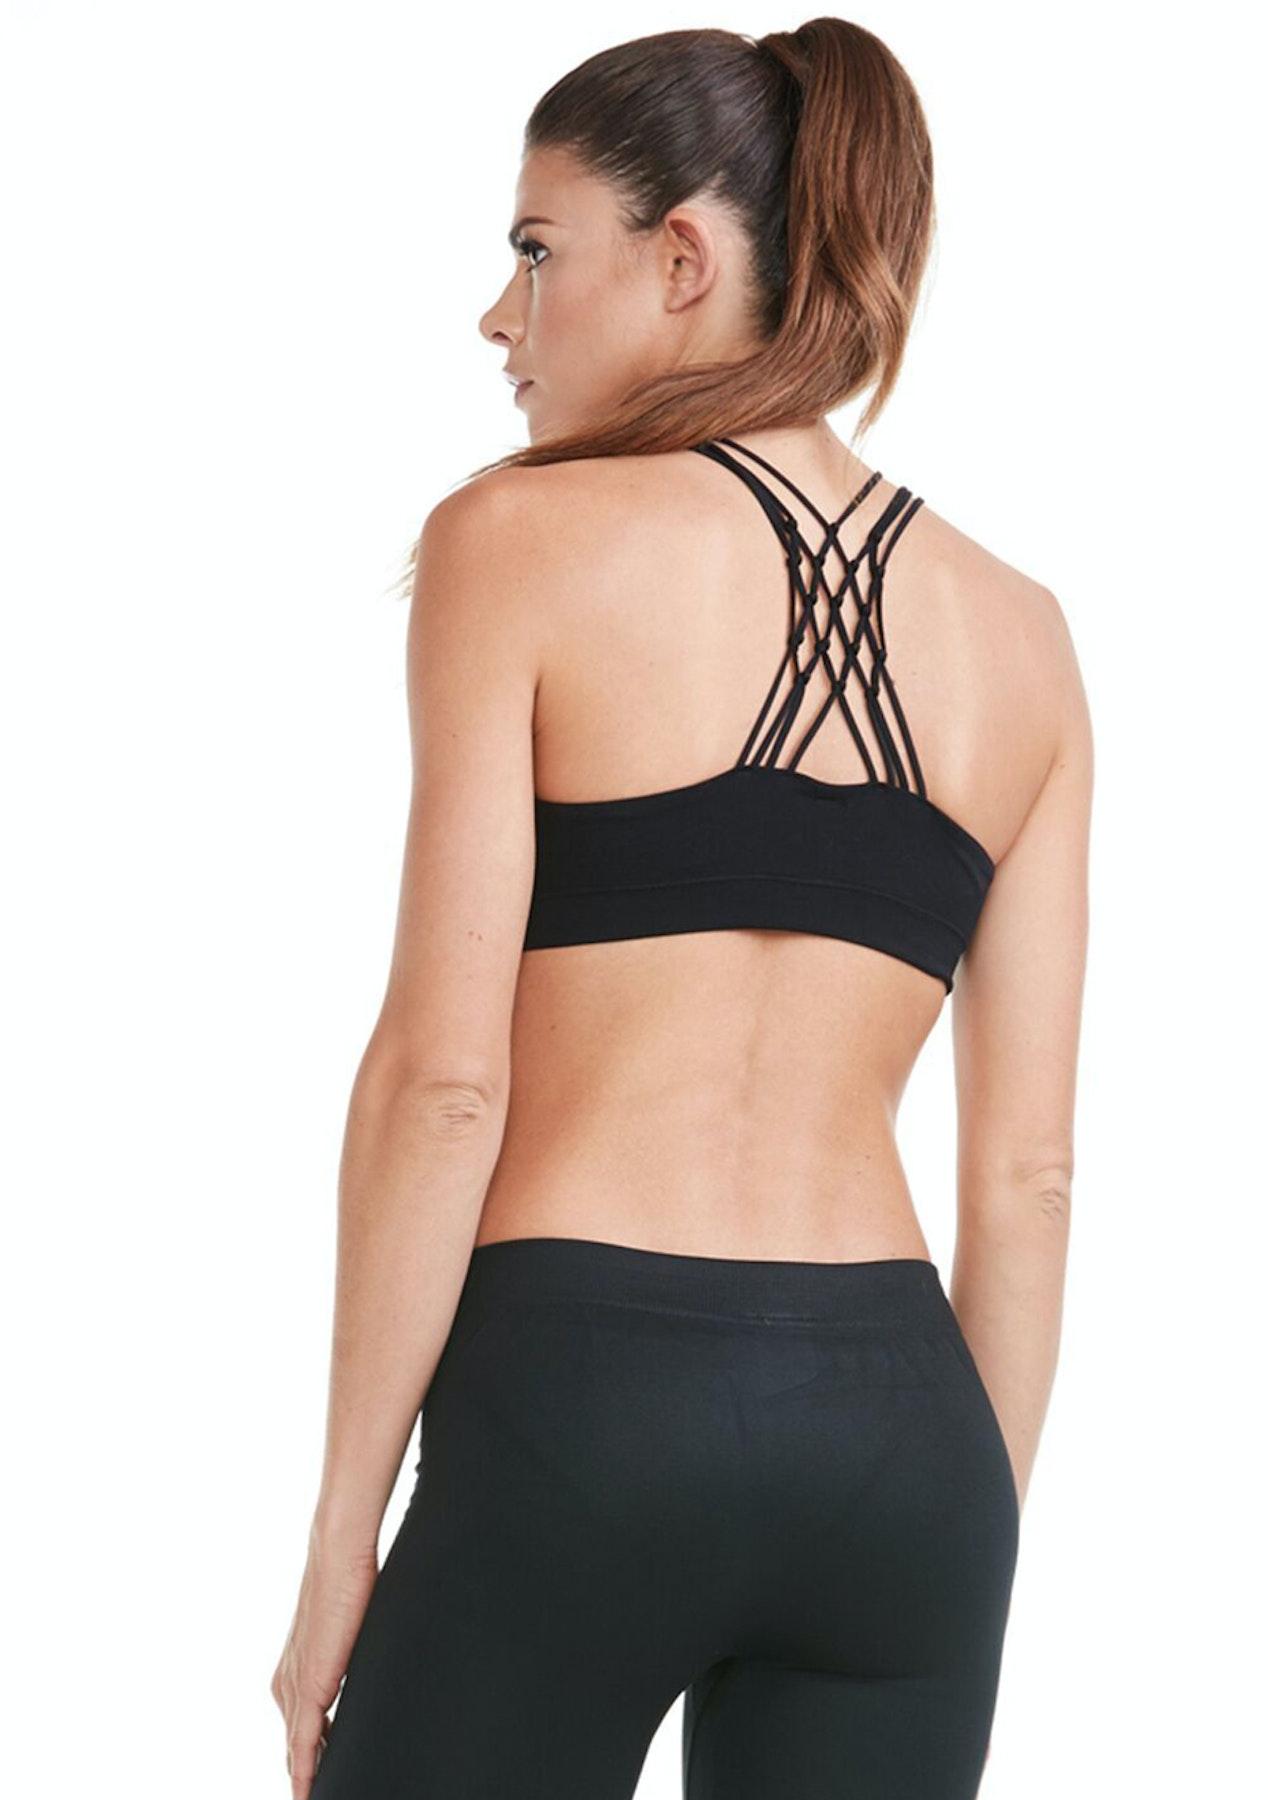 980676b9cdcc39 Electric Yoga - Diamond Back Bra - Black - Monochrome   Metallic Activewear  - Onceit